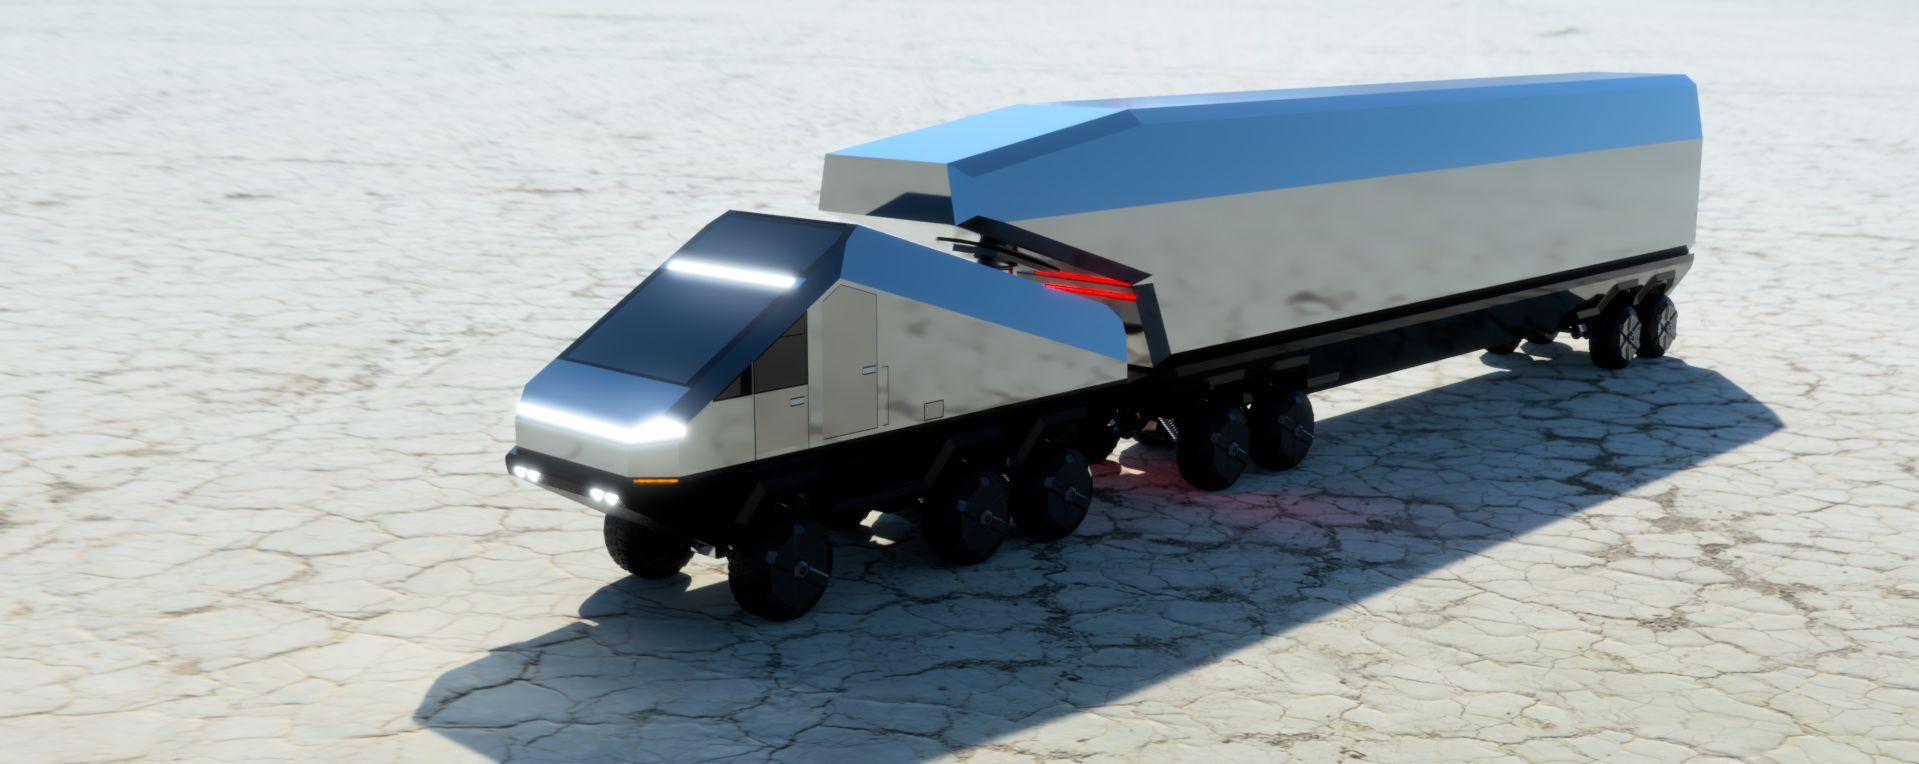 Tesla-cybervan-2020-apr-14-09-00-12am-000-customizedview2690994088-png-3500-3500